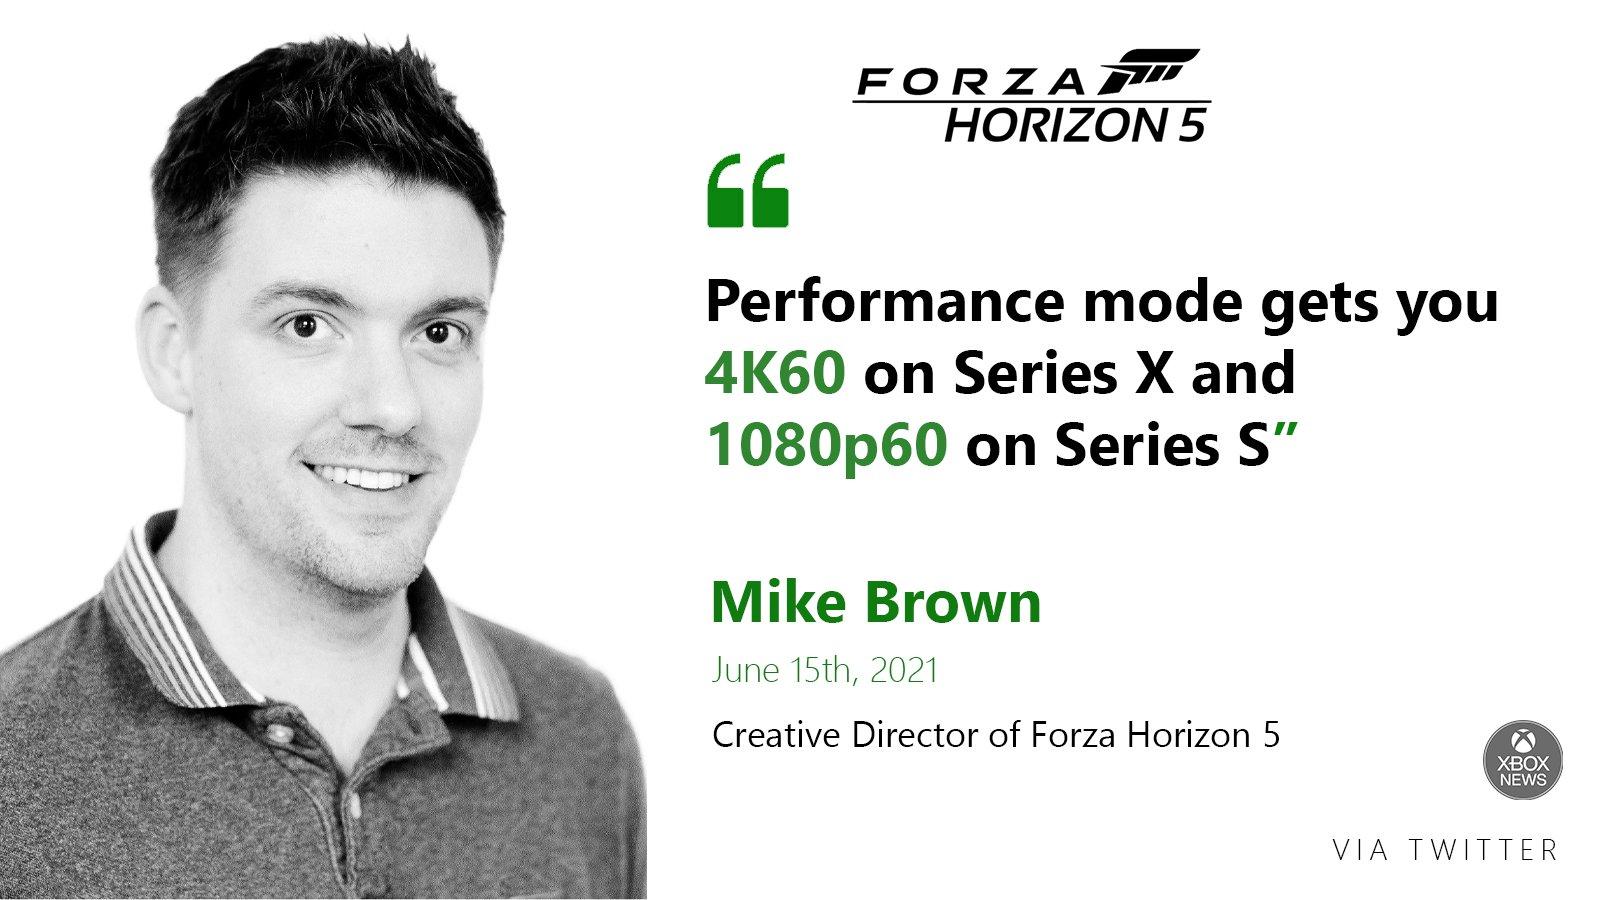 Forza Horizon 5 cílí na 4K při 60 FPS u Xbox Series X forza5